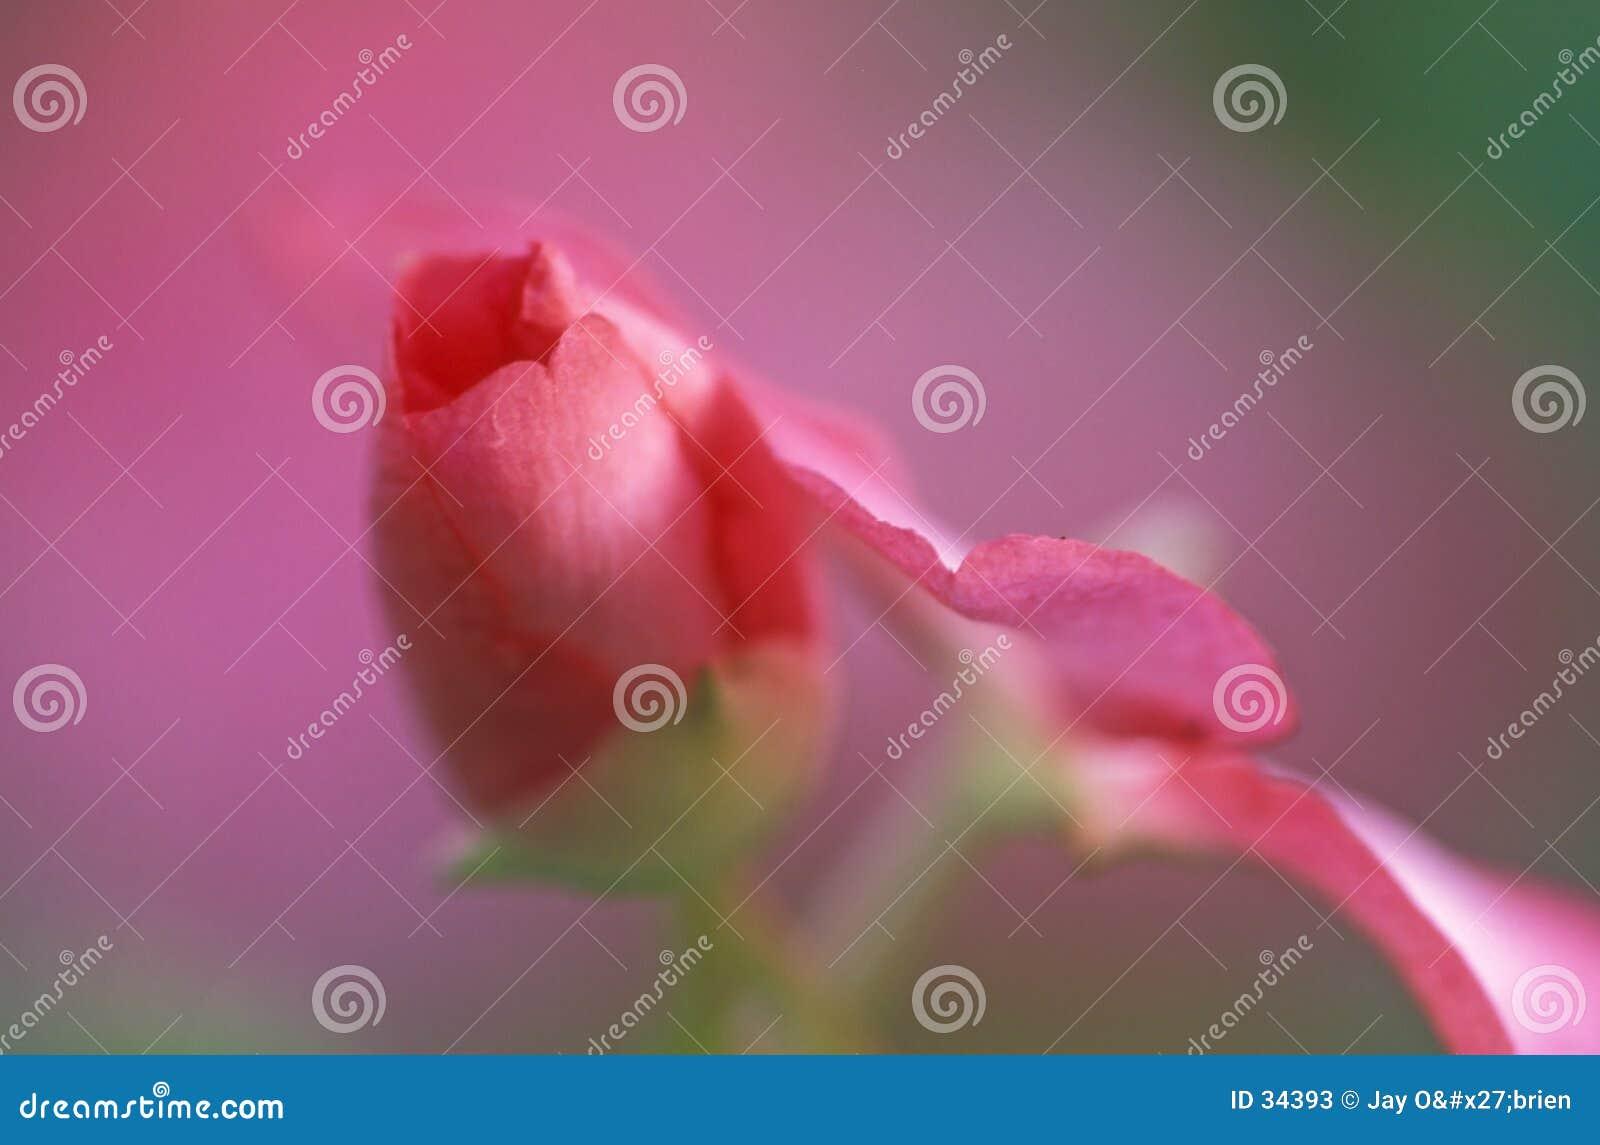 Abstrait rose